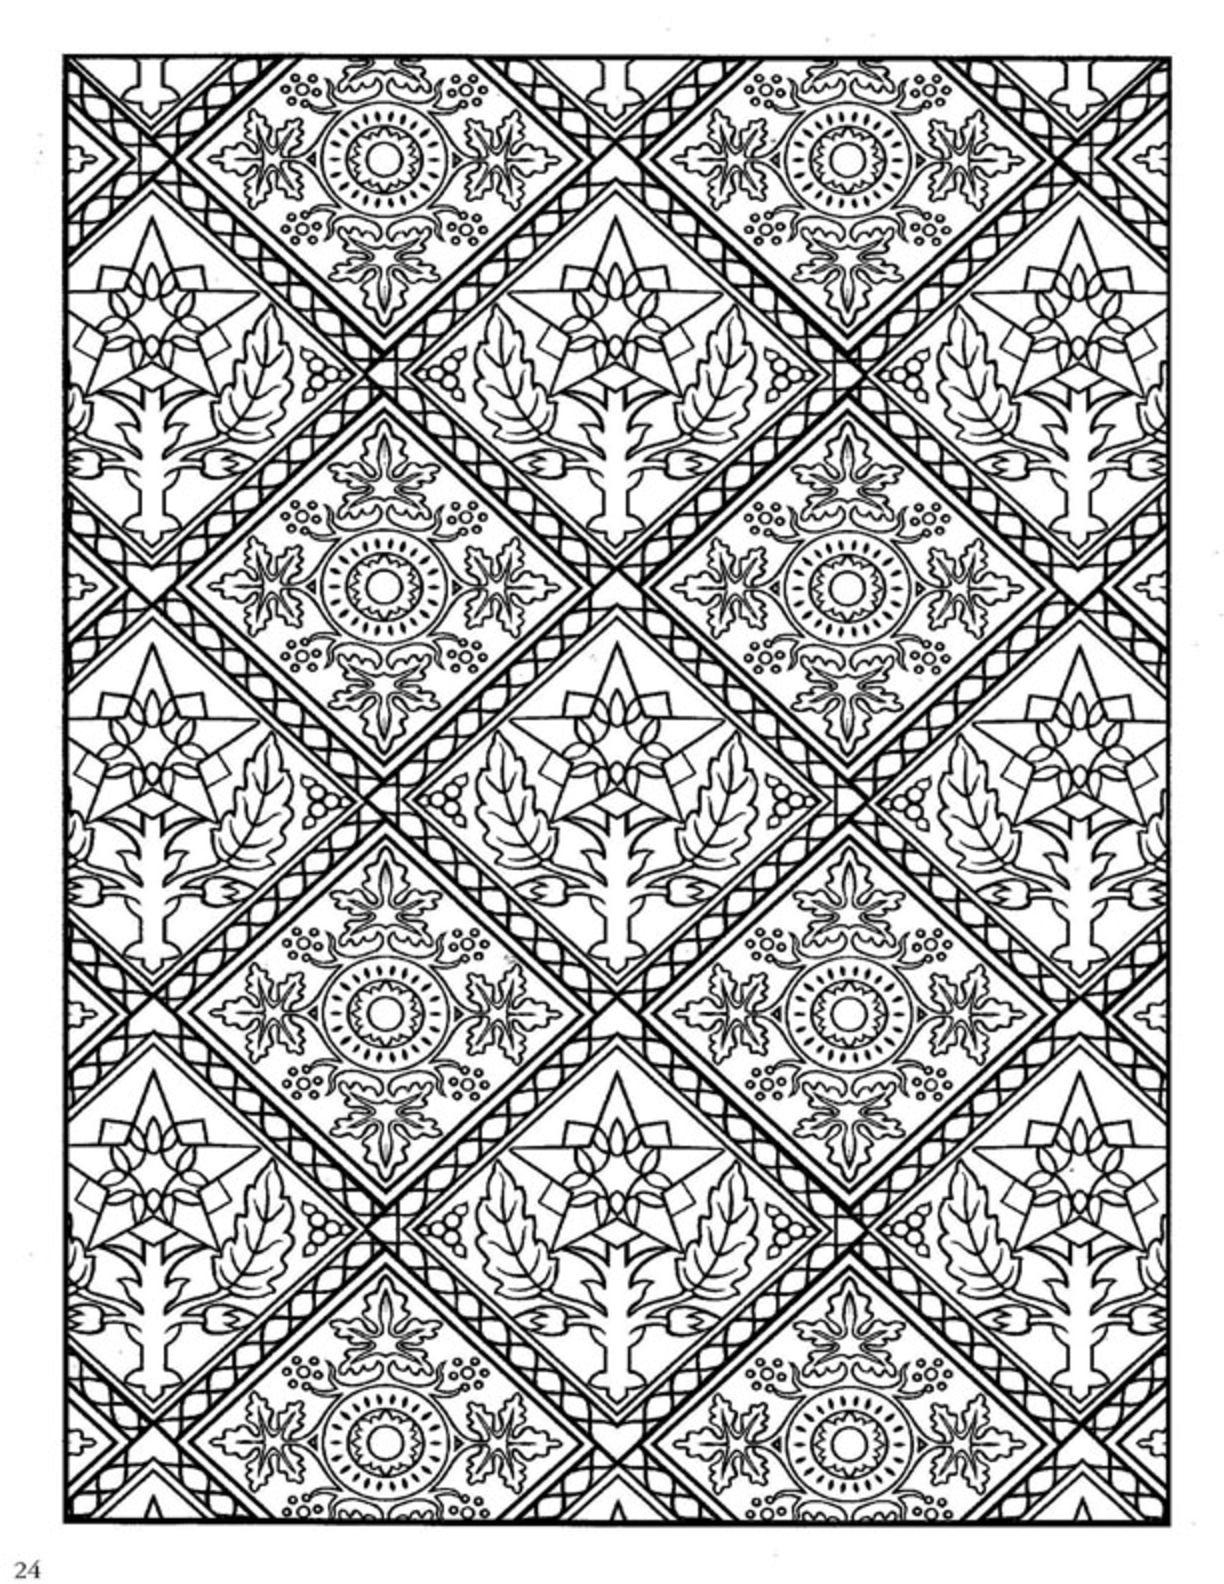 Decorative Tile Designs Dover Decorative Tile Coloring Book  Dover Coloring  Pinterest